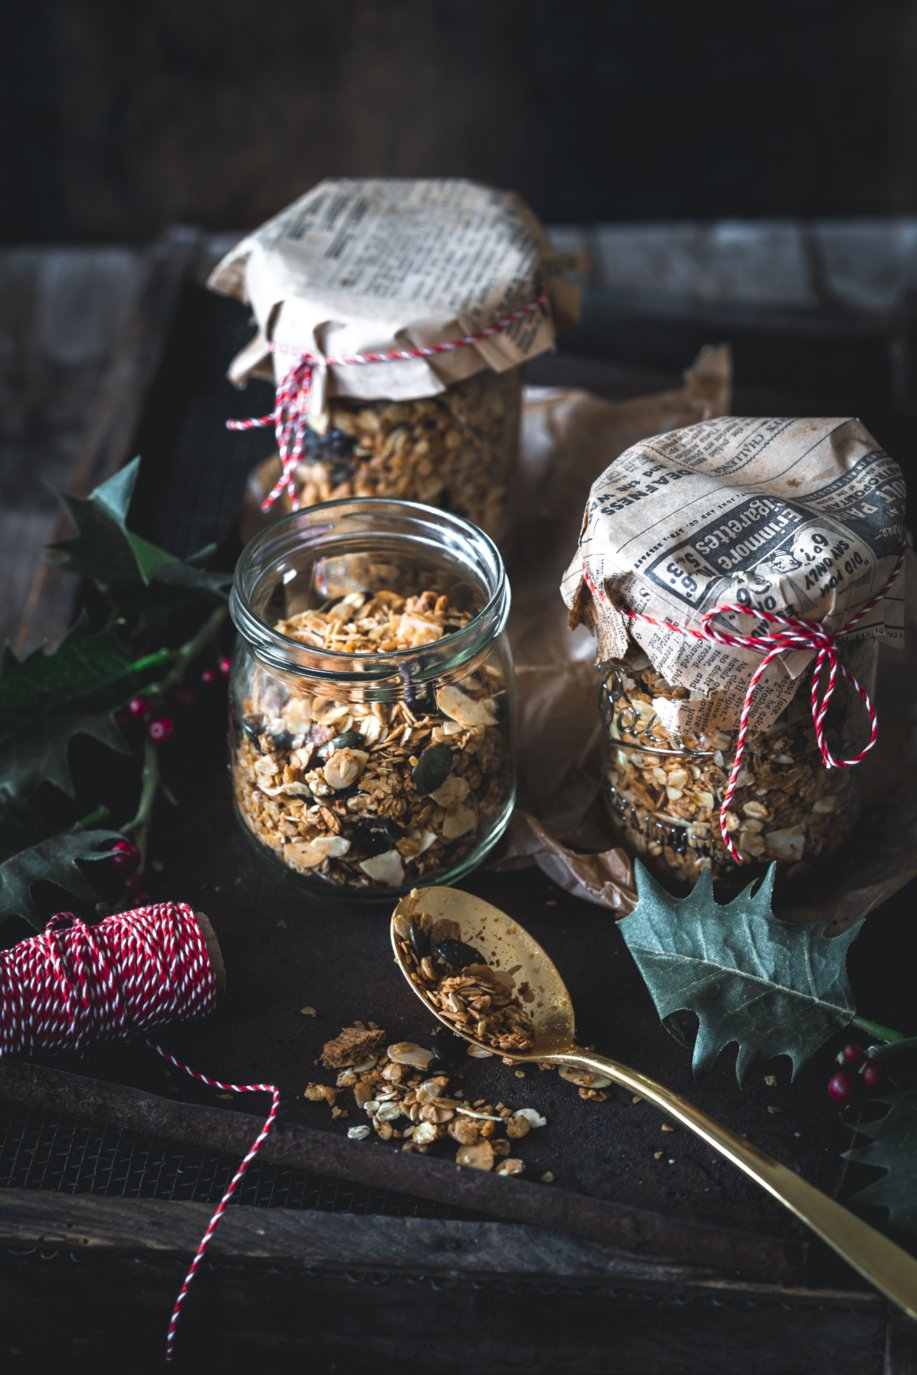 Homemade Granola mit Cranberries und Spekulatius